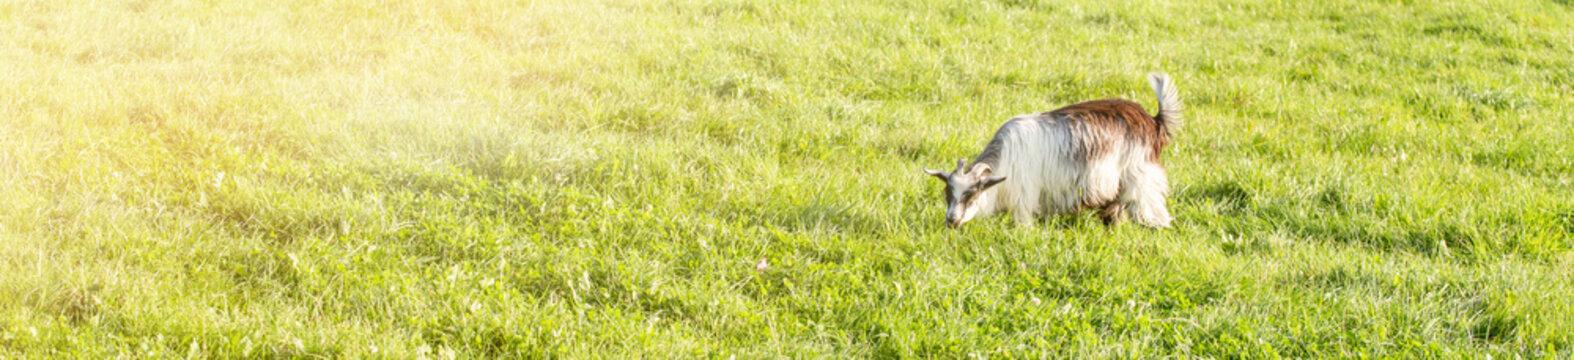 goats in the field under sun light